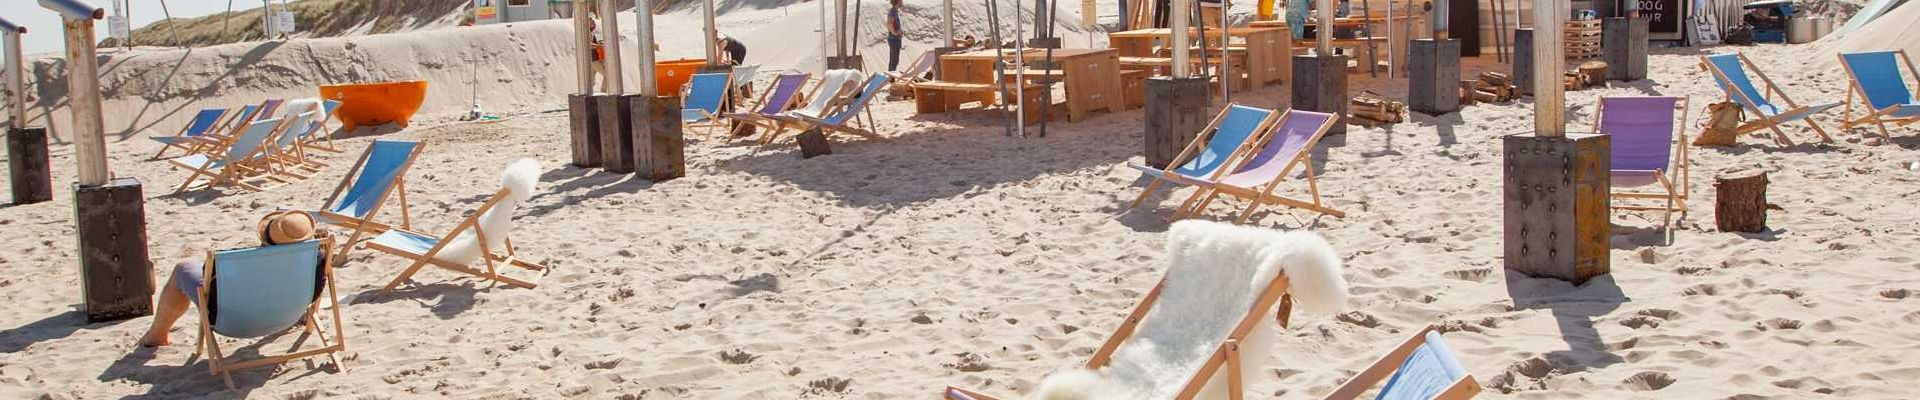 Weltevree Beach